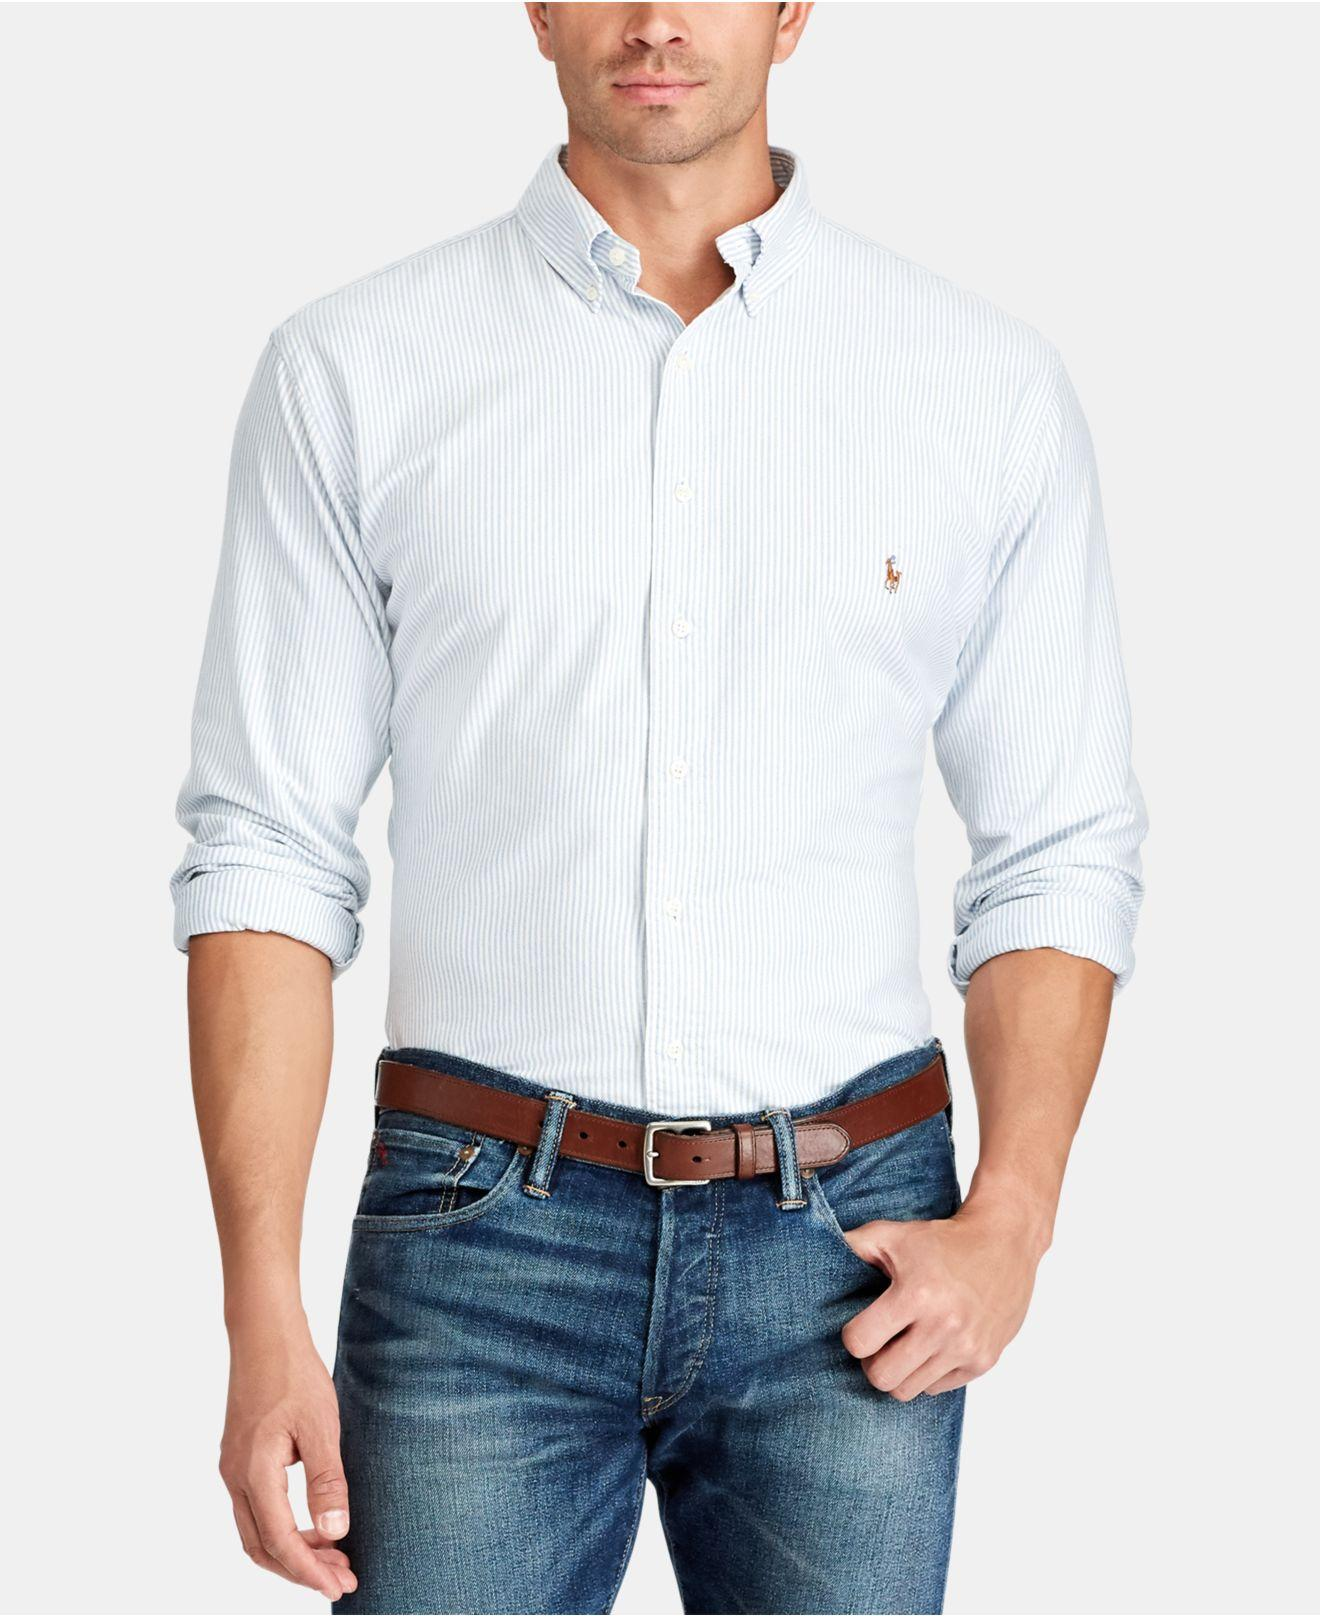 47692cd89a9 Lyst - Polo Ralph Lauren Button-down Oxford Shirt in Blue for Men